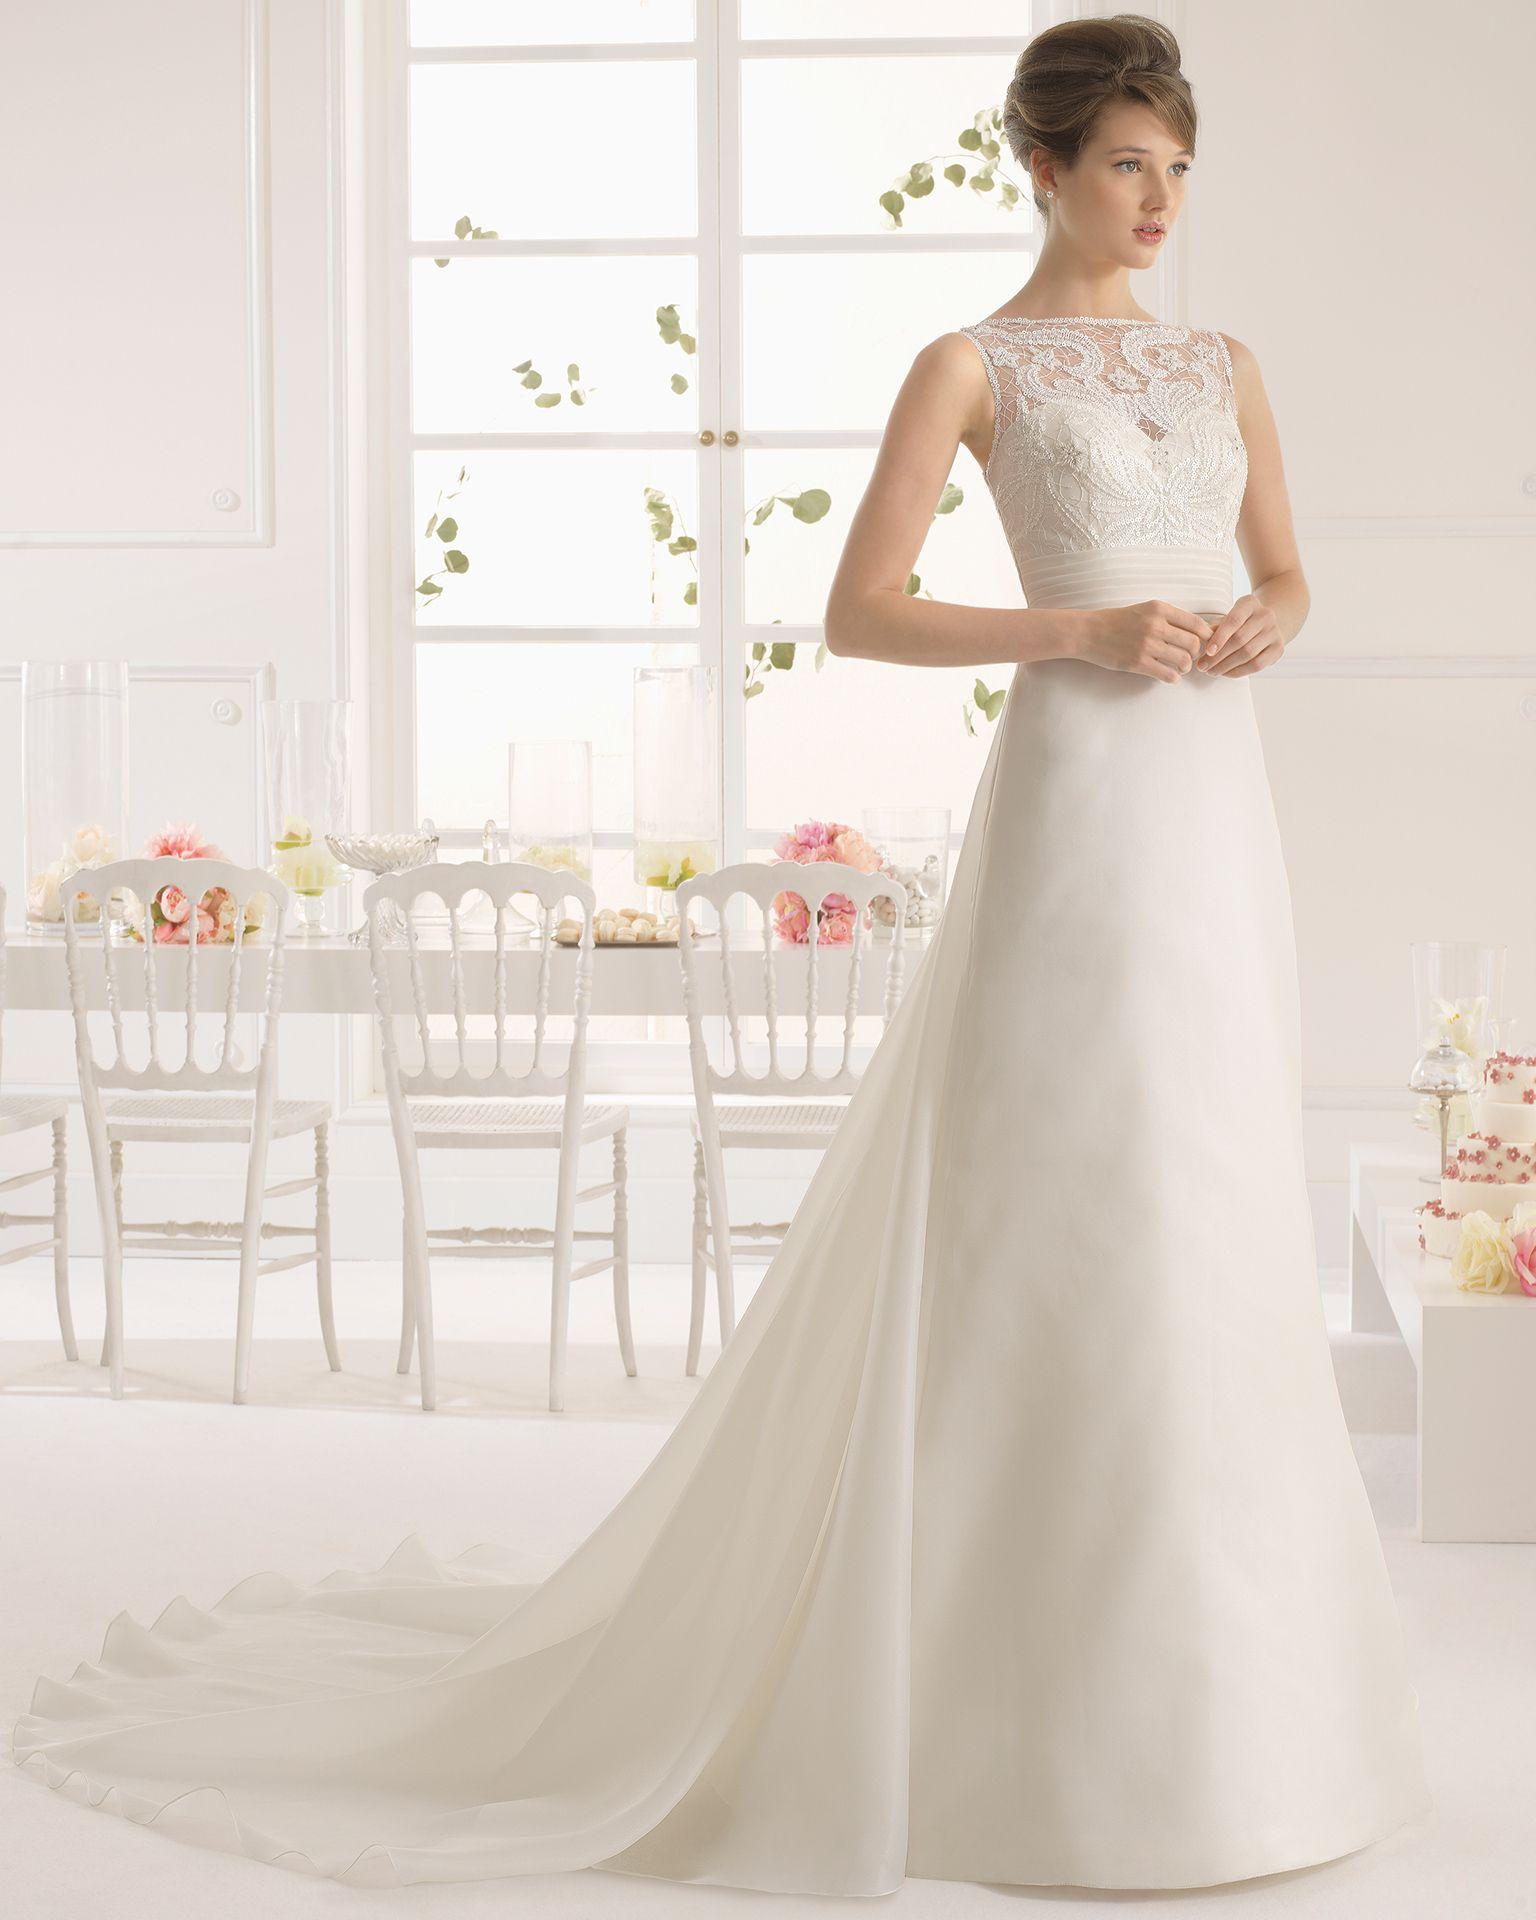 Used Designer Wedding Gowns: Style #8C284 ANTON